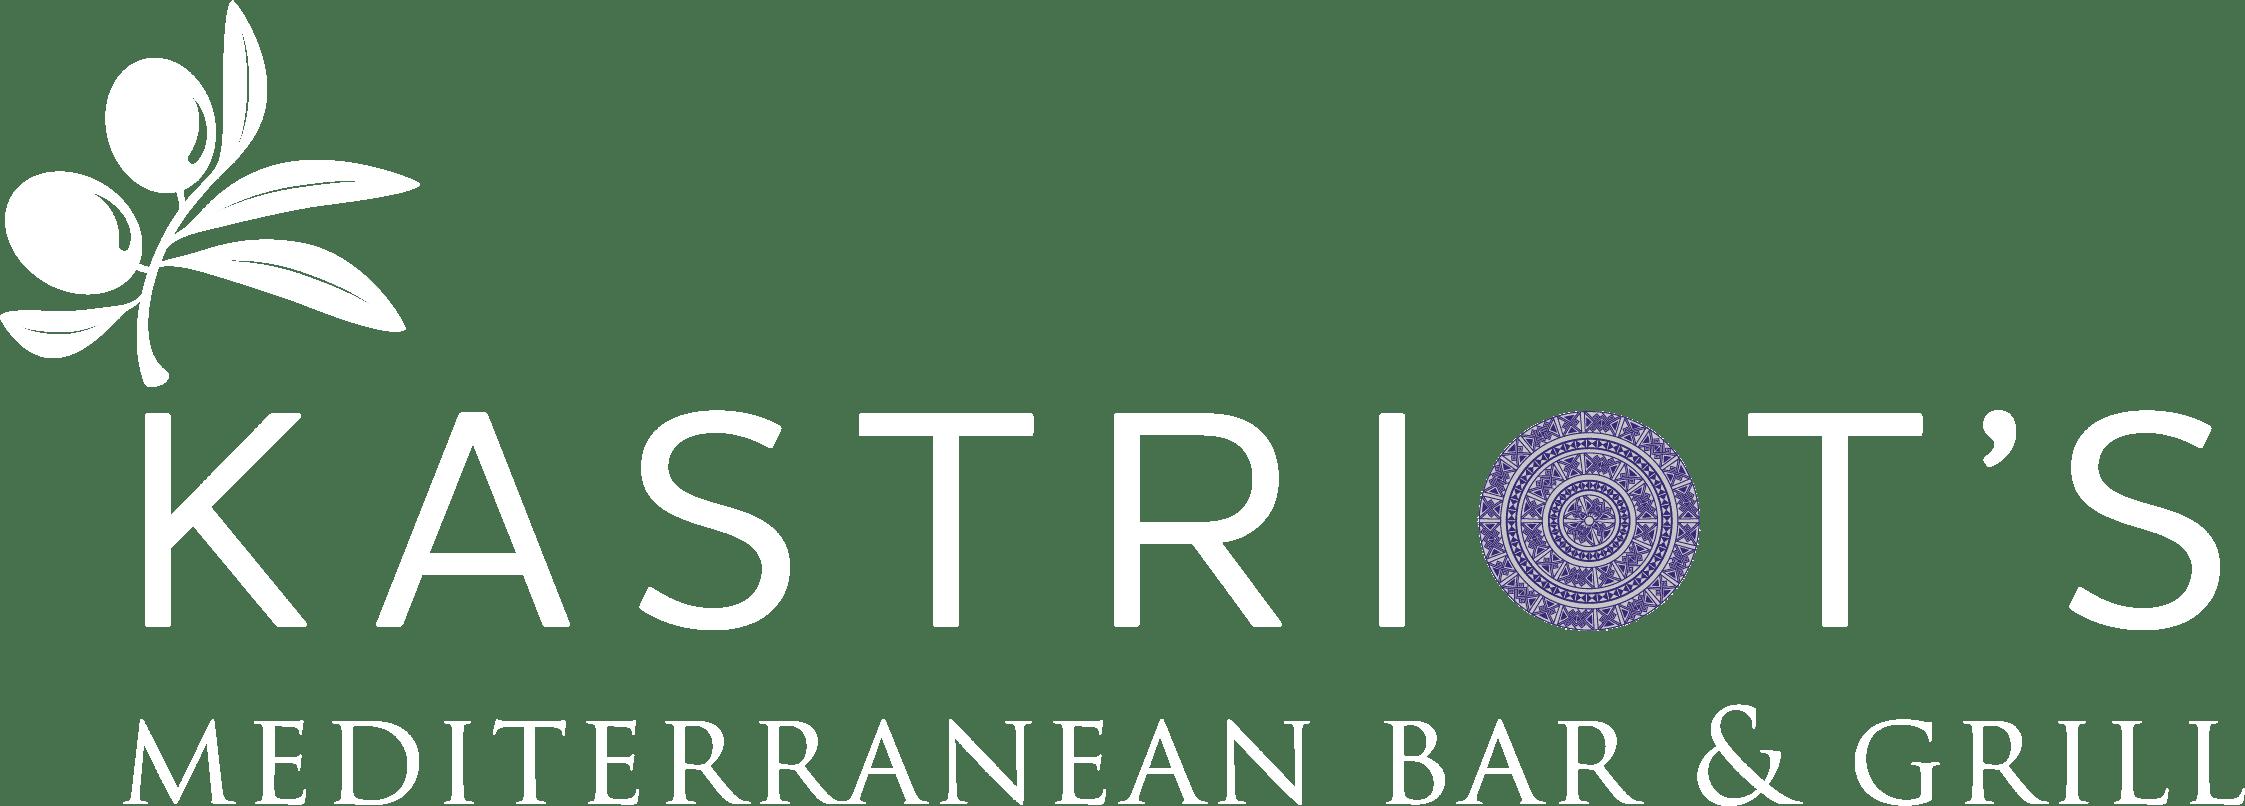 kastriots-white-logo-glasgow